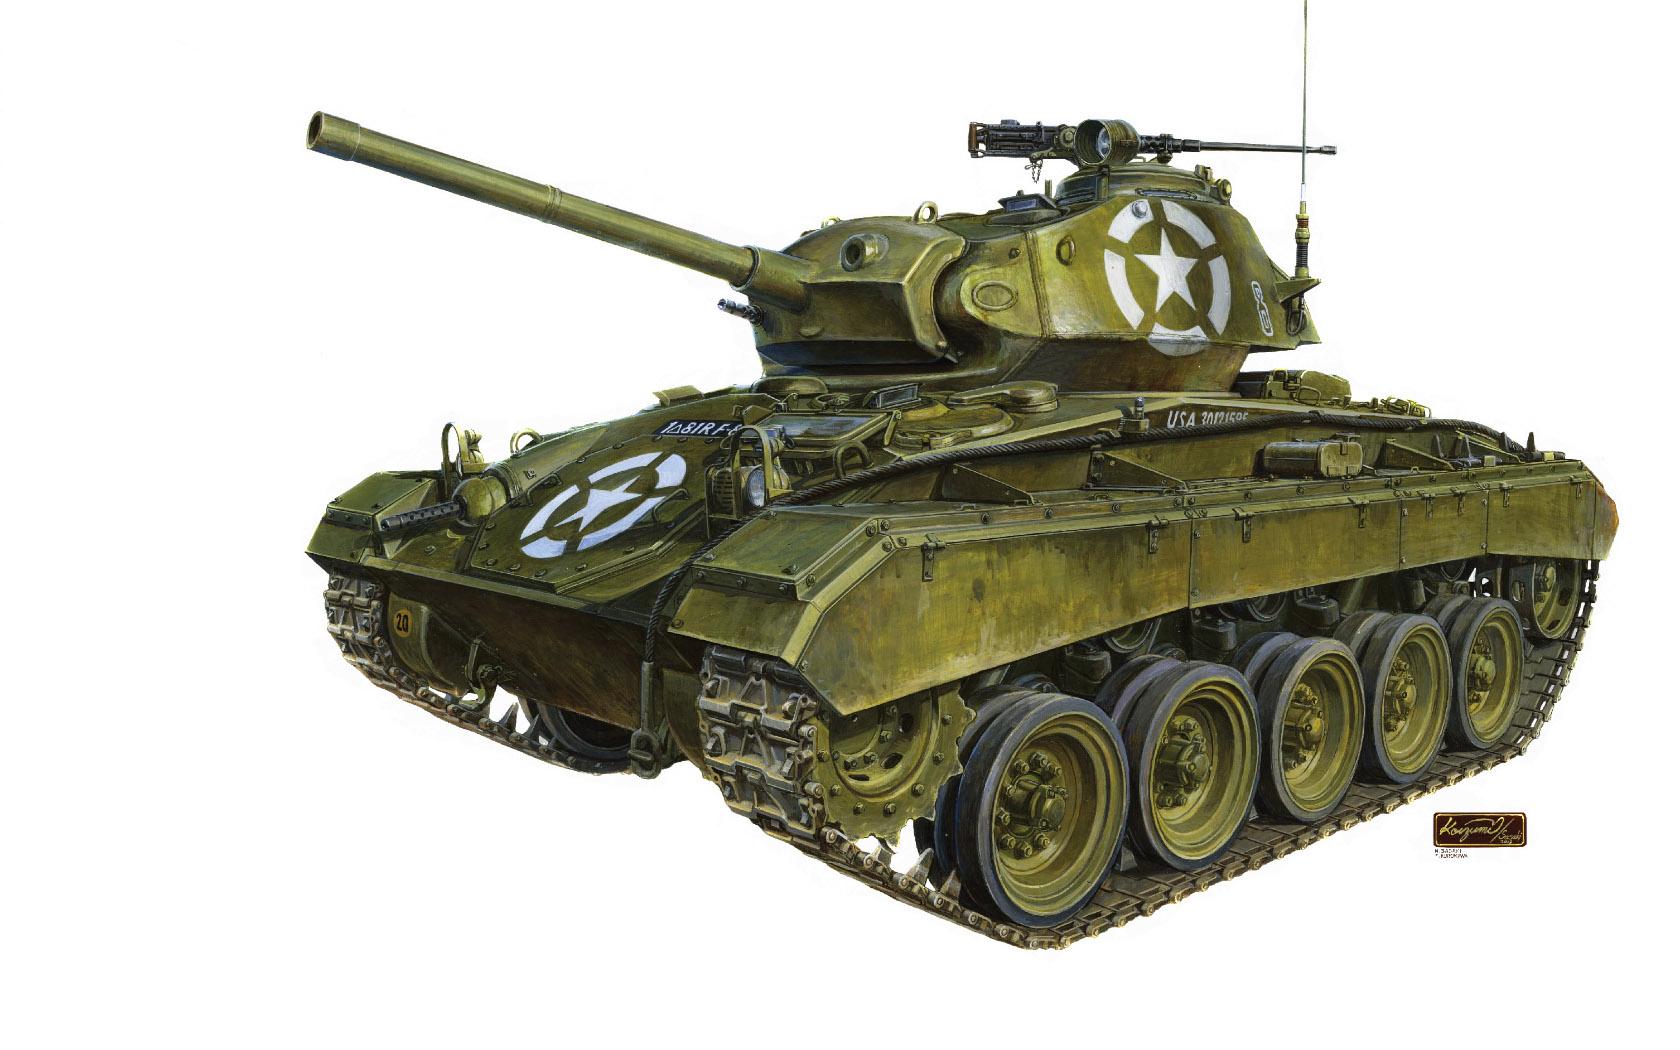 рисунок US WWII M24 Chaffee Light Tank